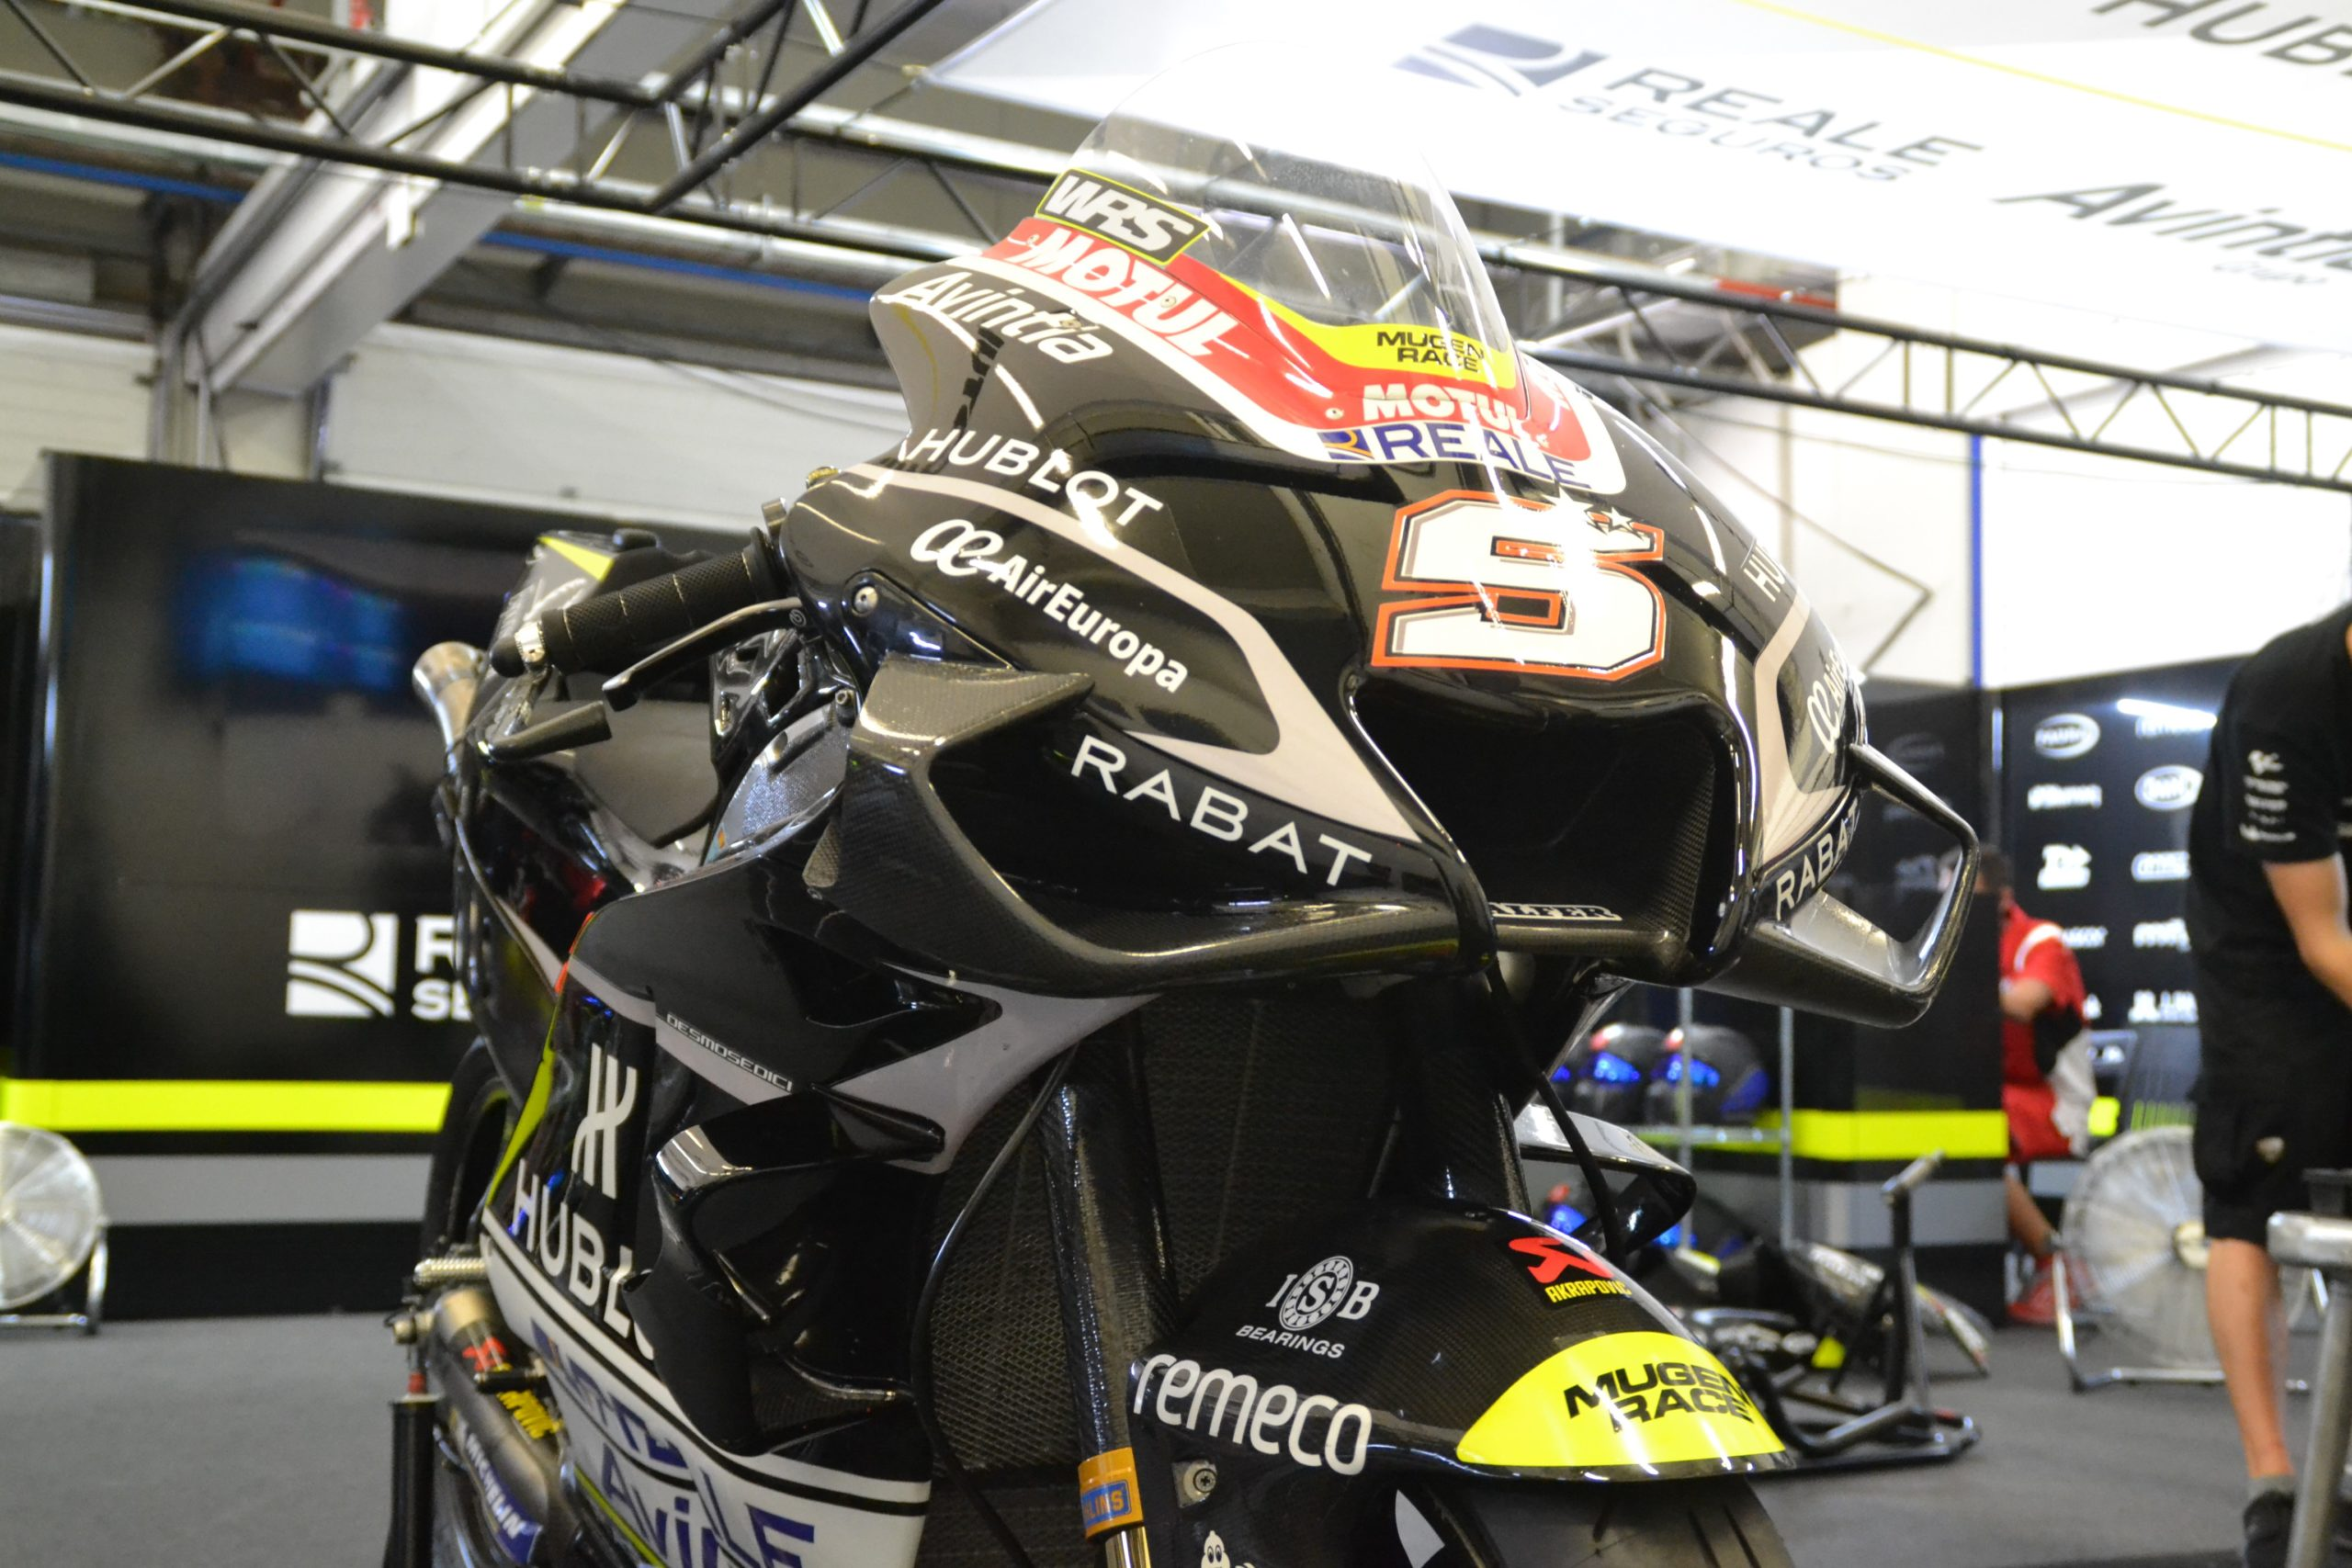 ISB Spot Moto GP Reale Avintia 4